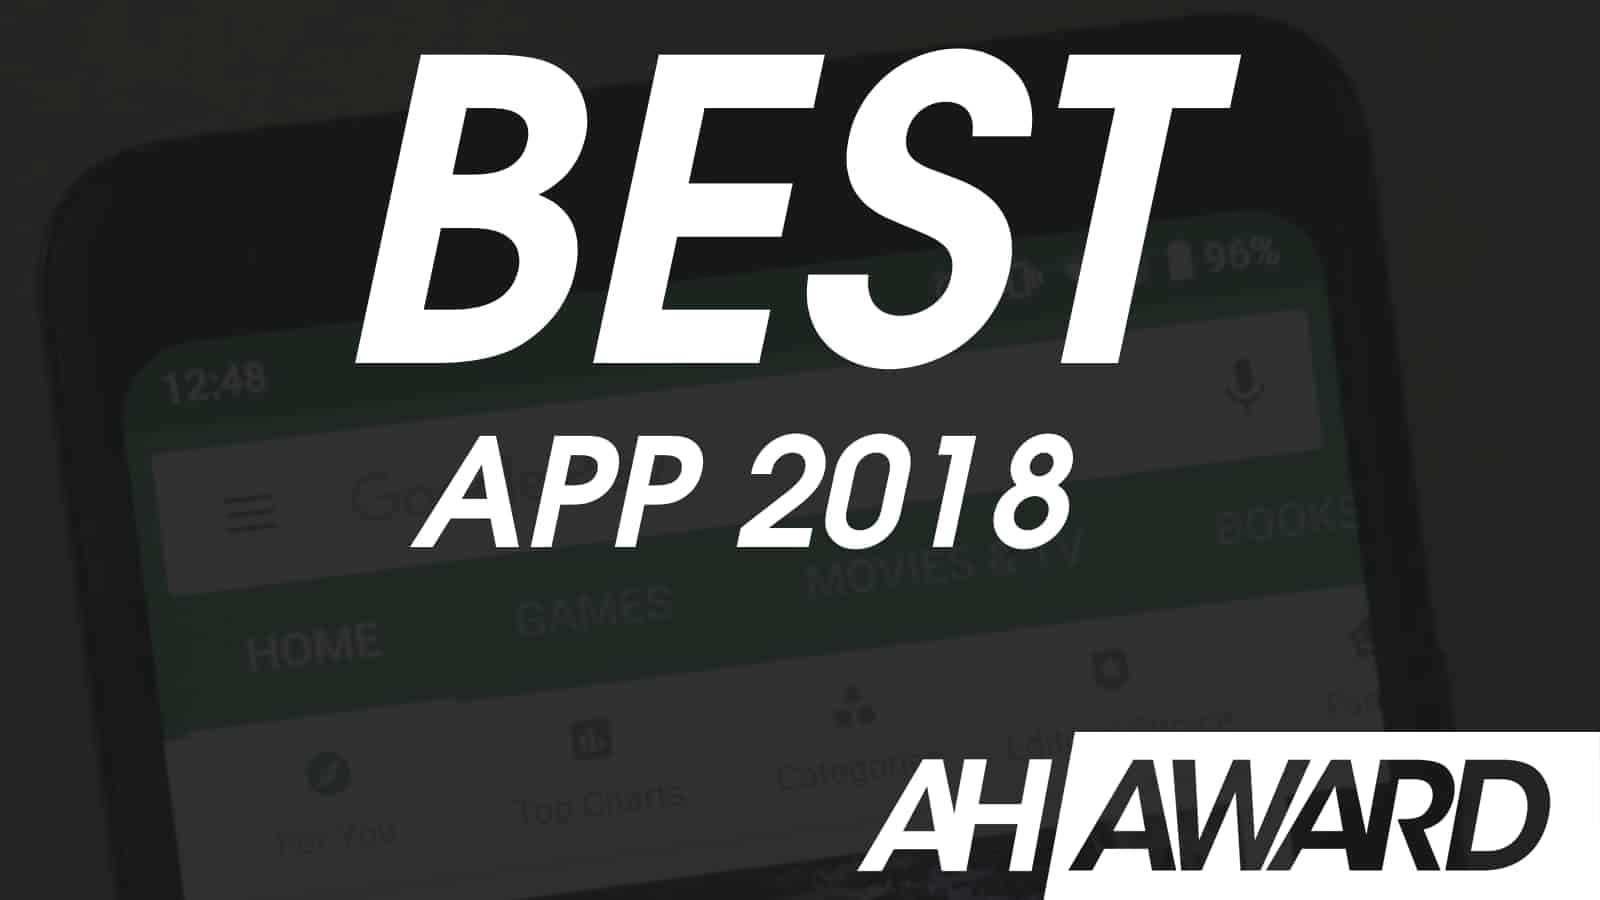 ANDROID HEADLINES AWARDS BEST APP 2018